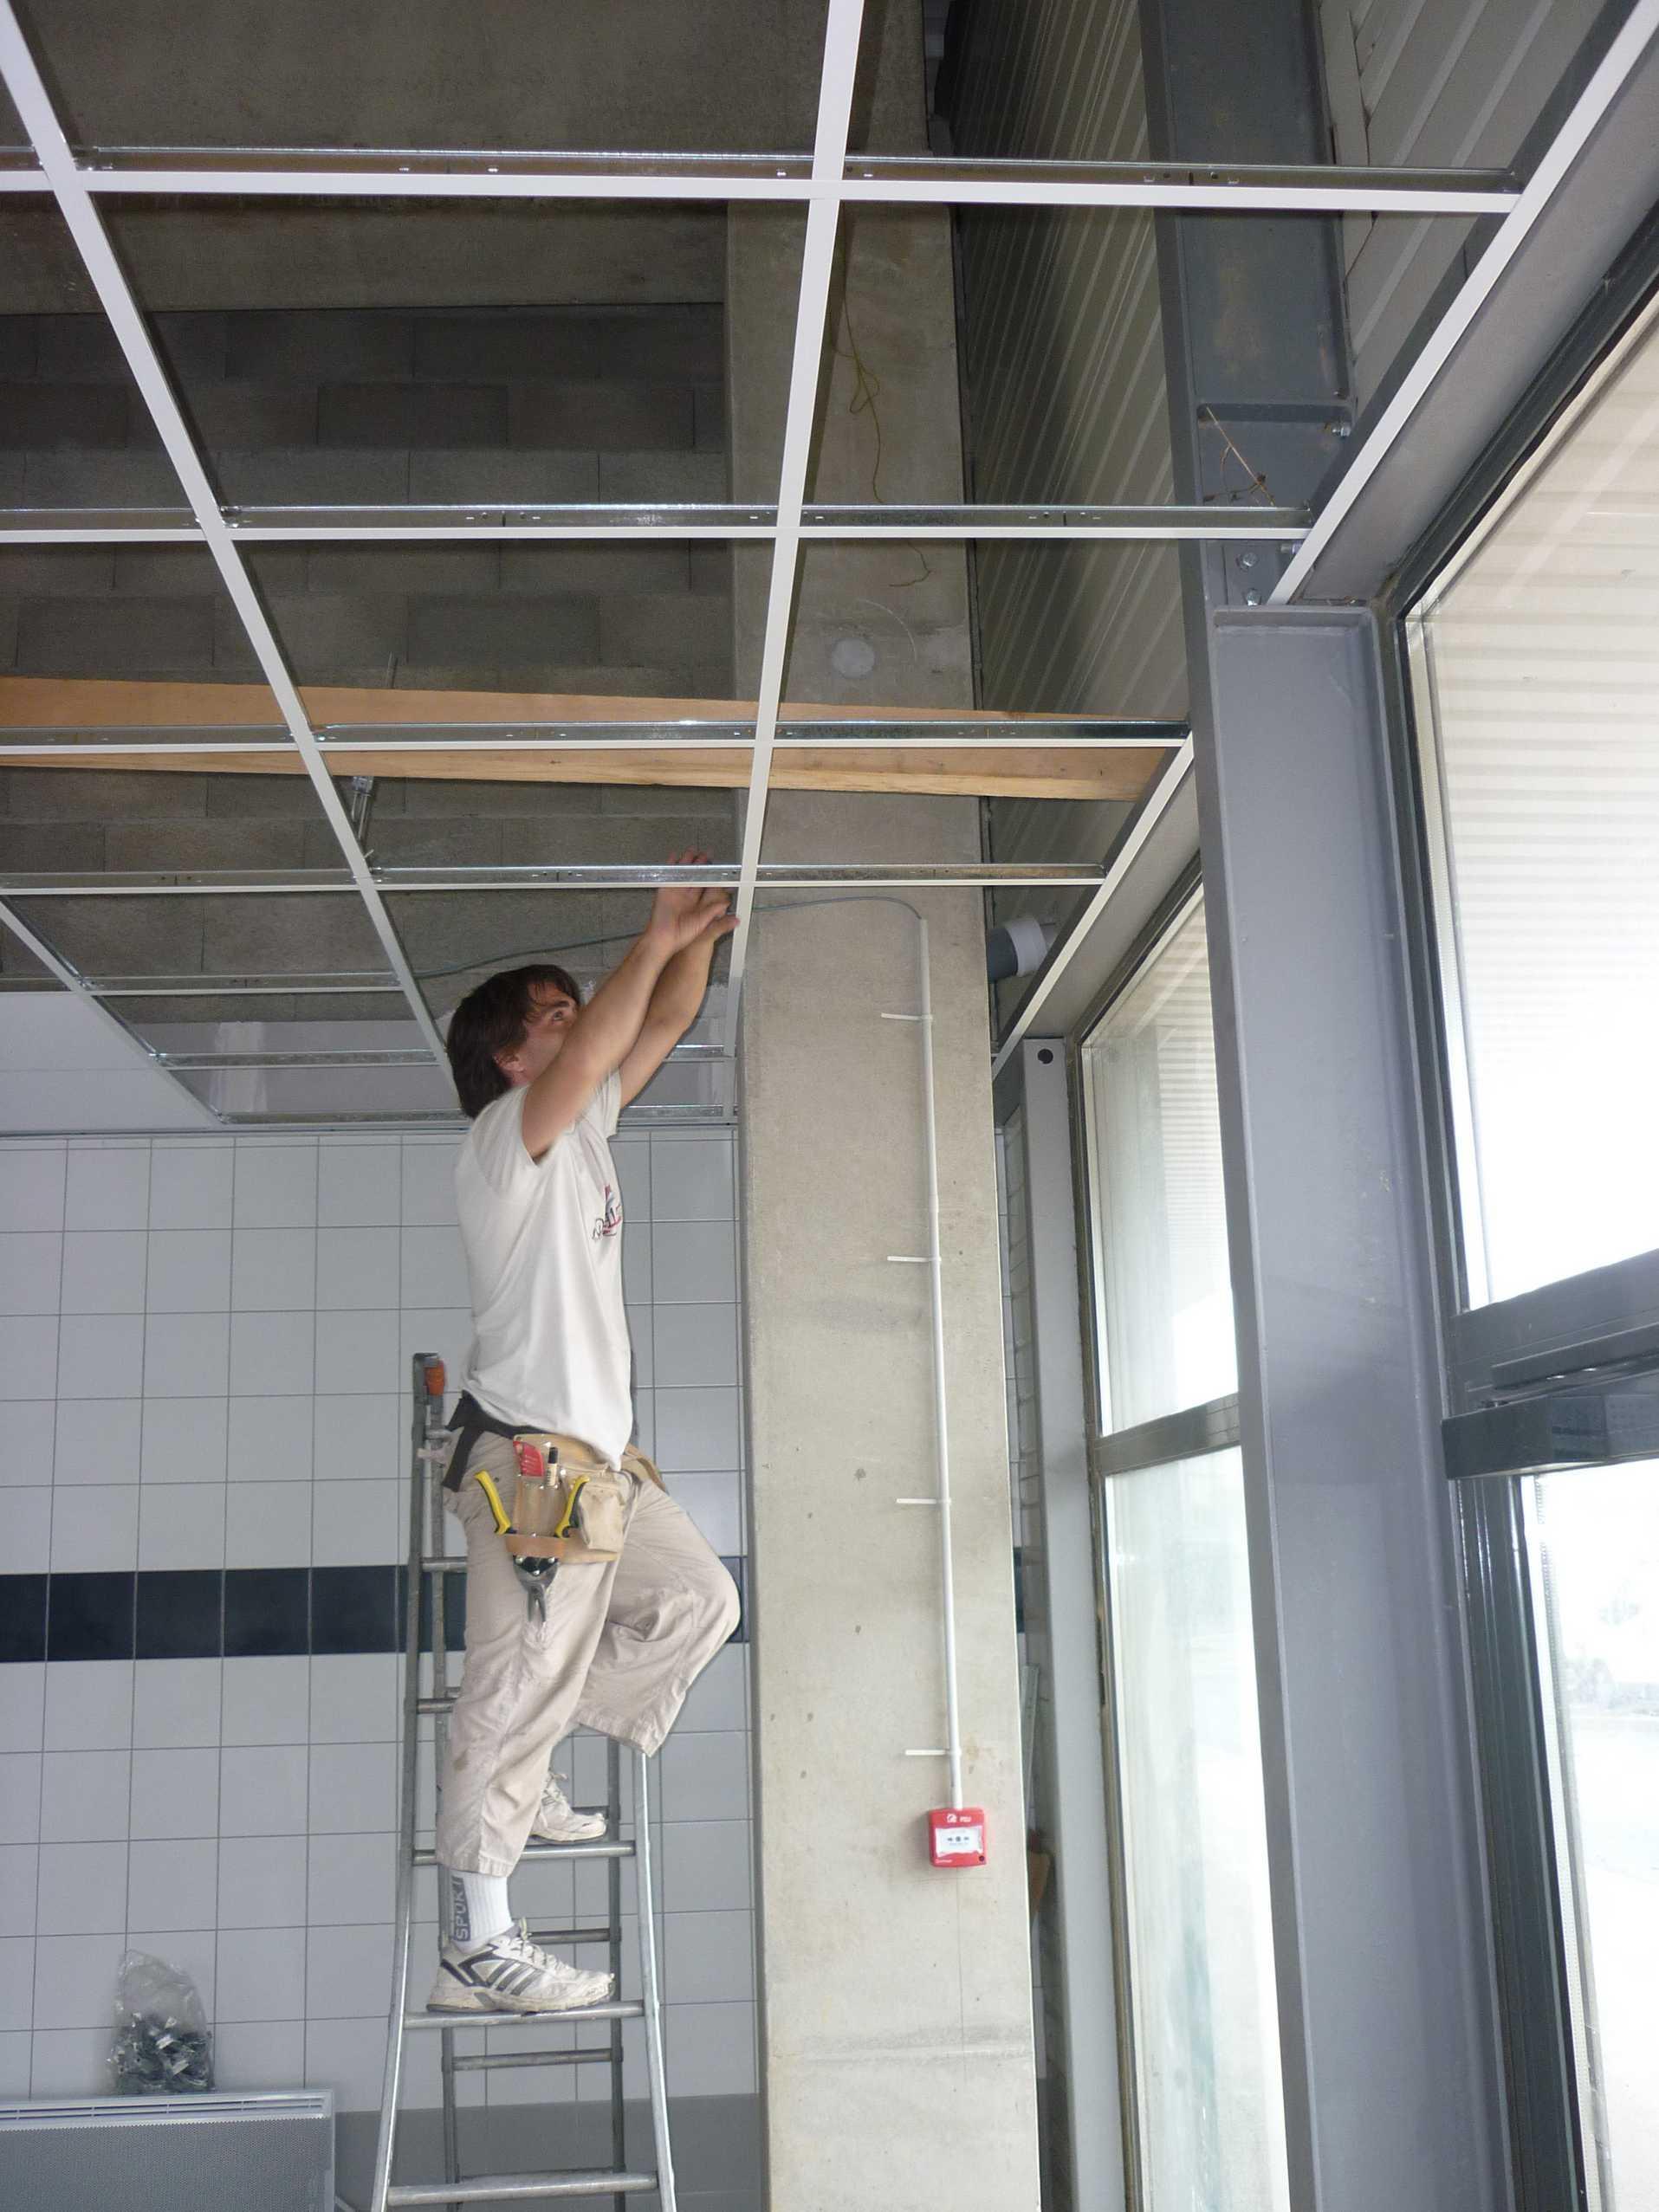 Am nagement d un garage speedy bruno geli architecte for Faire faux plafond garage